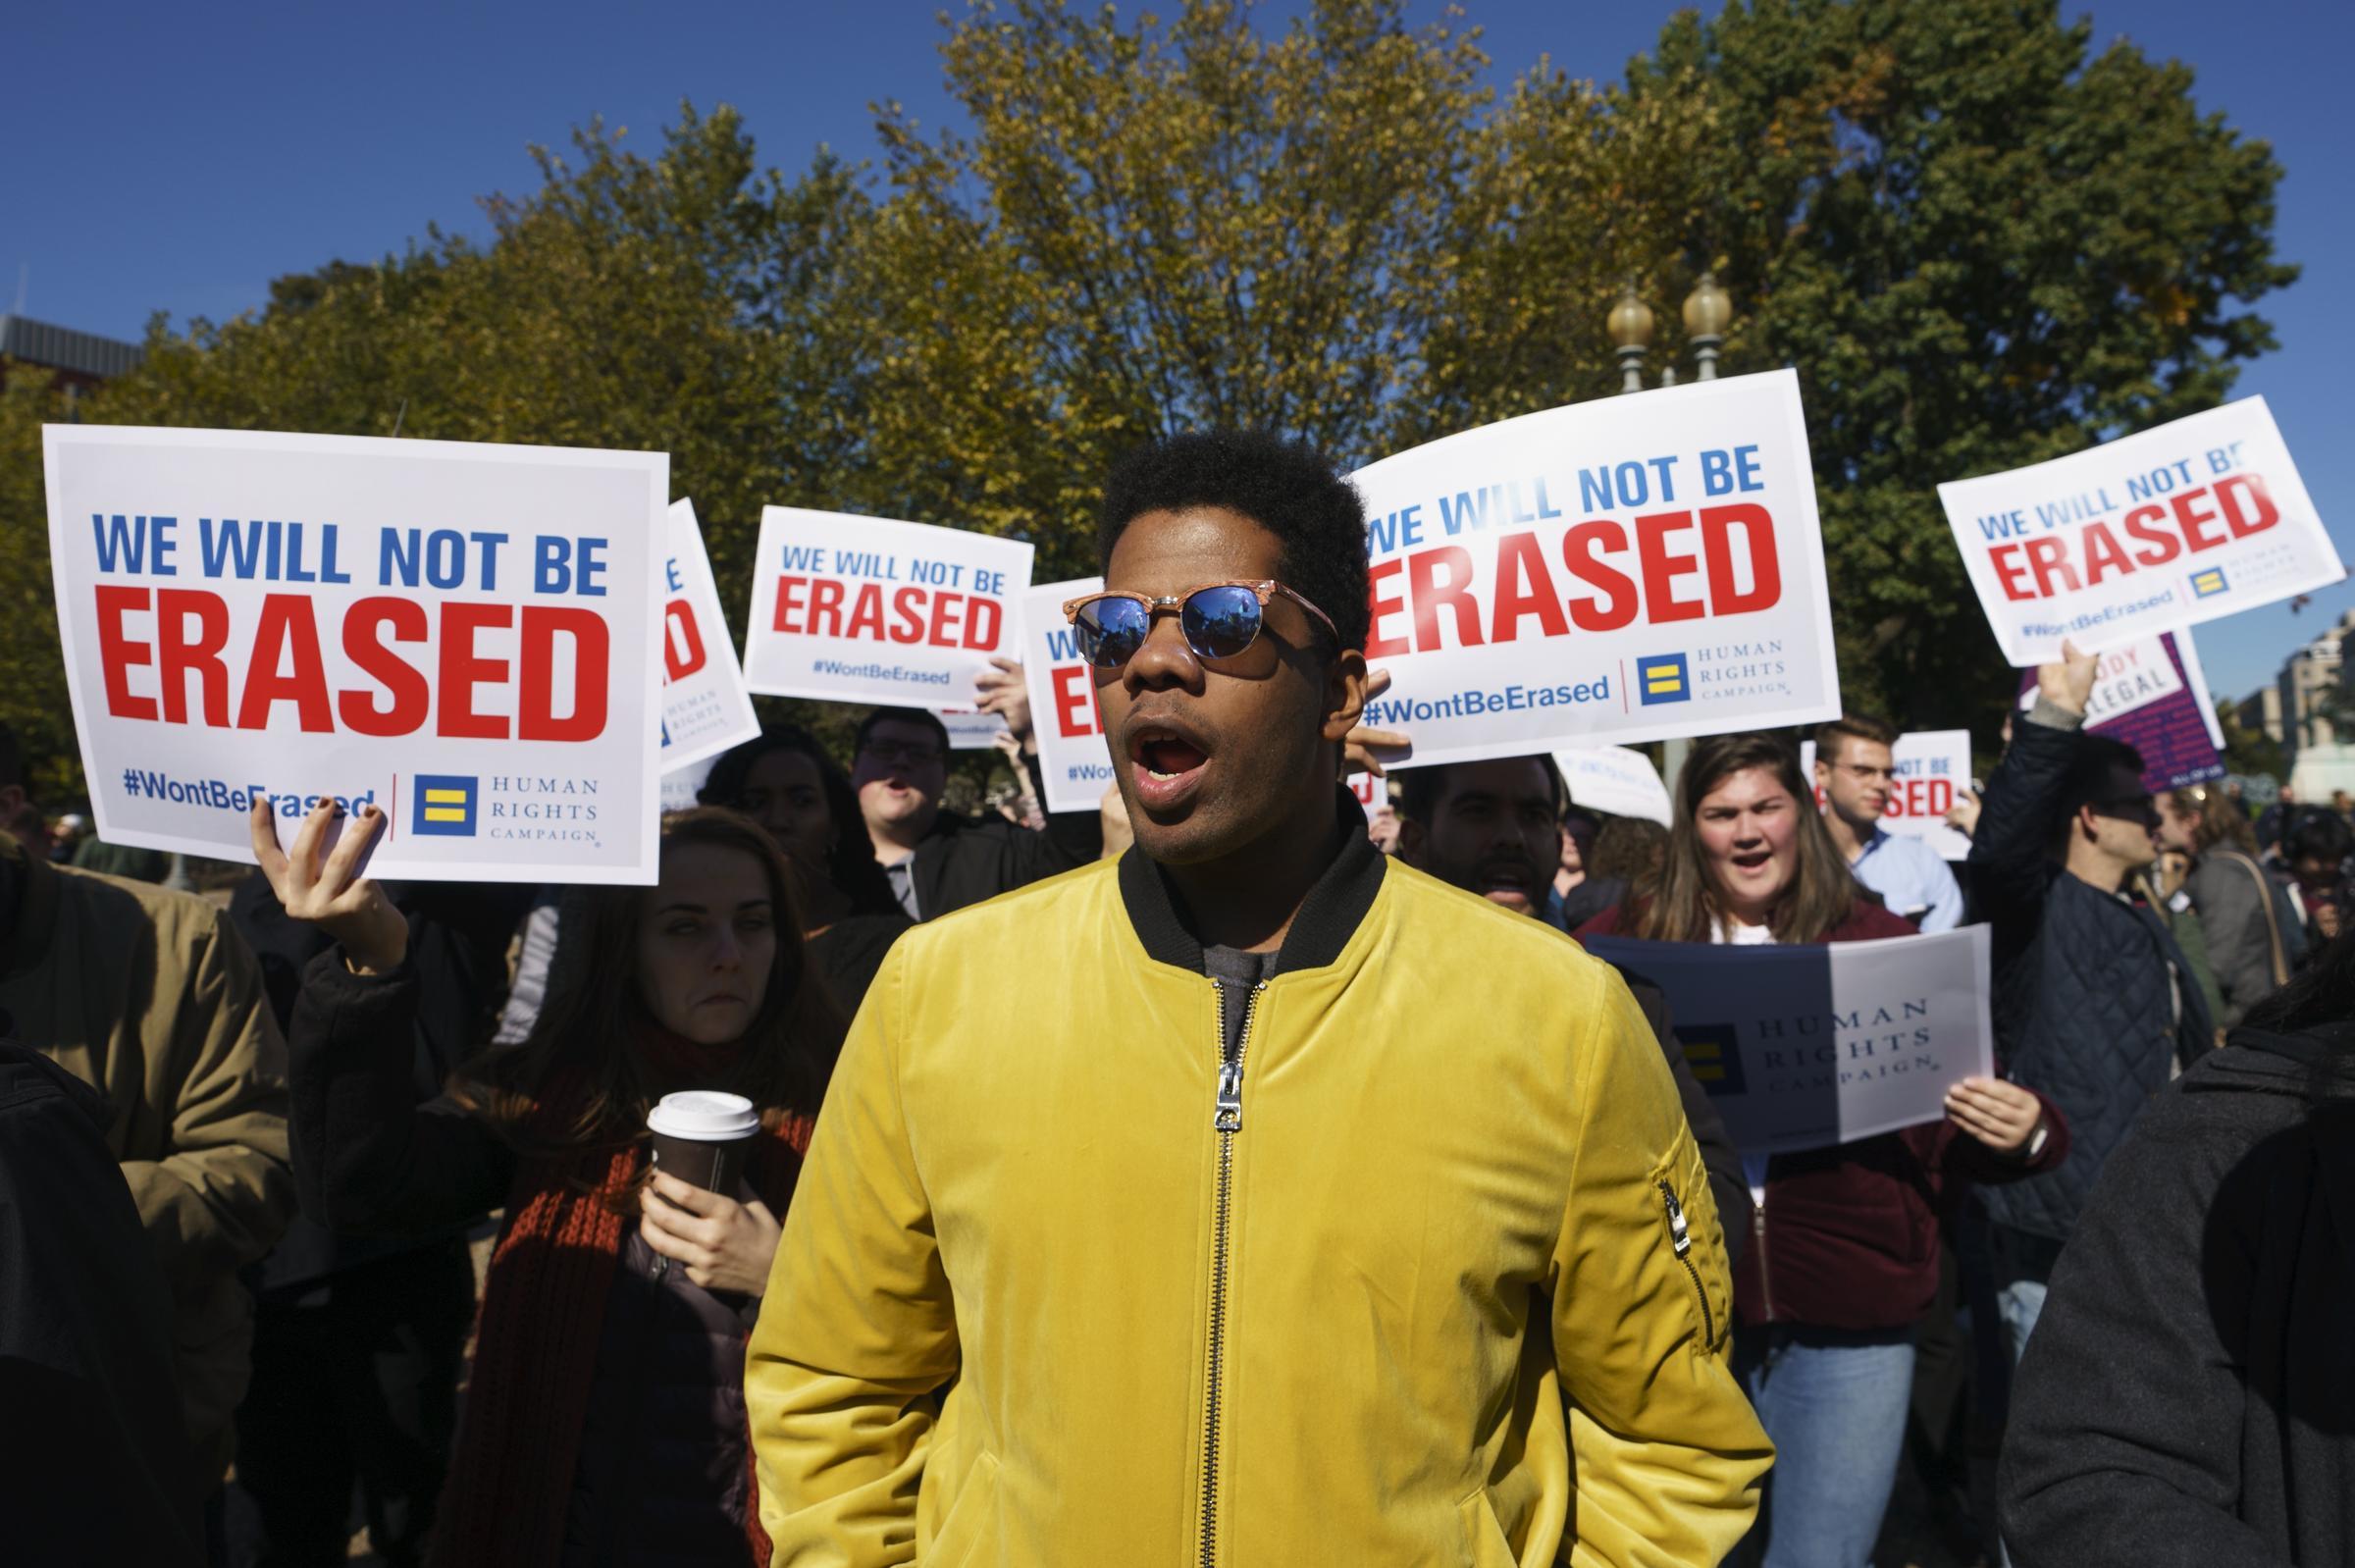 ACLU Vows To Sue Over Trump's Anti-Transgender Plan